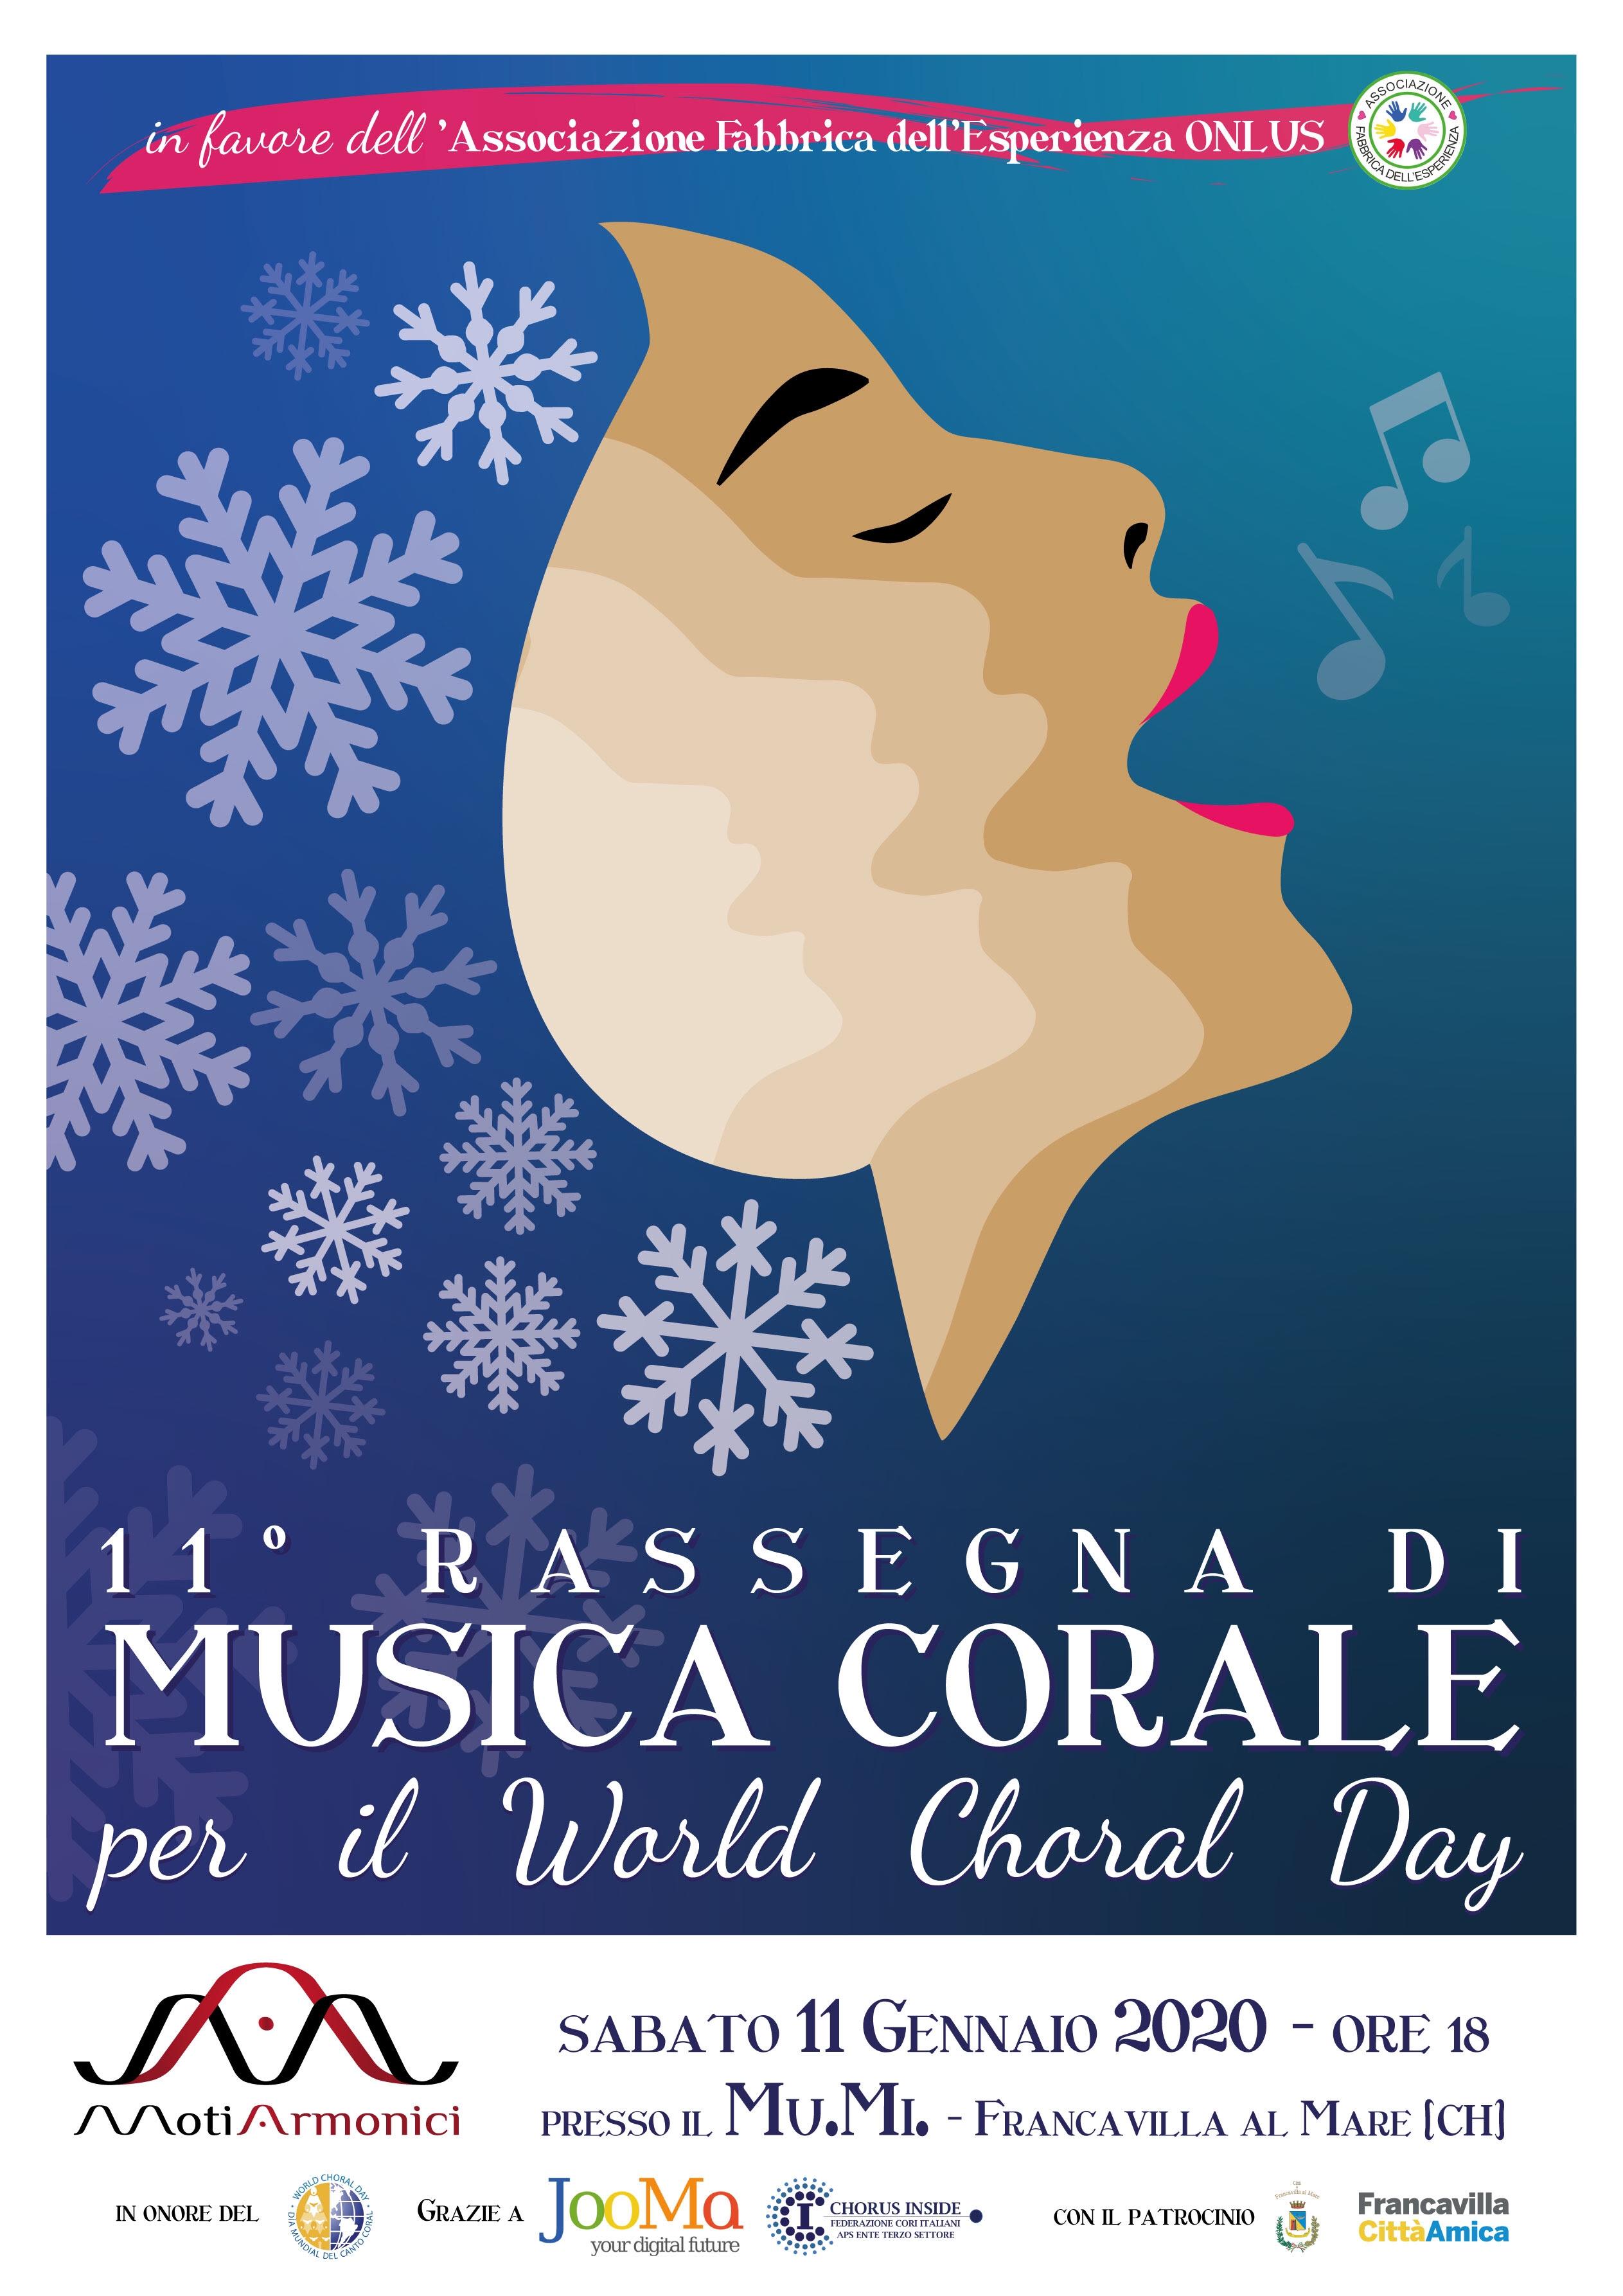 Oggi al Mumi il World Choral Day